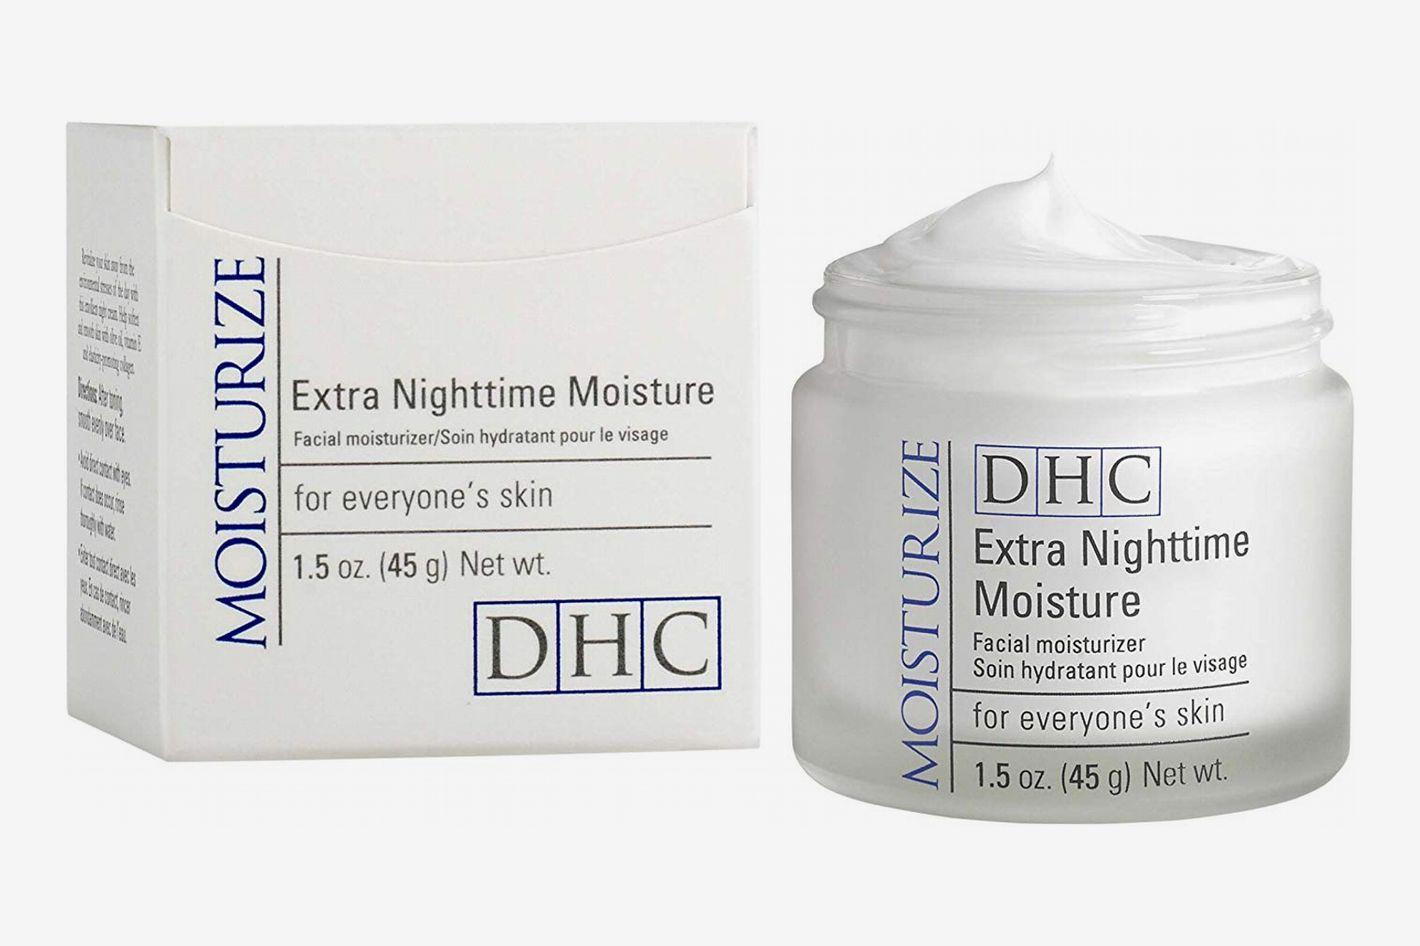 DHC Extra Nighttime Moisturizer